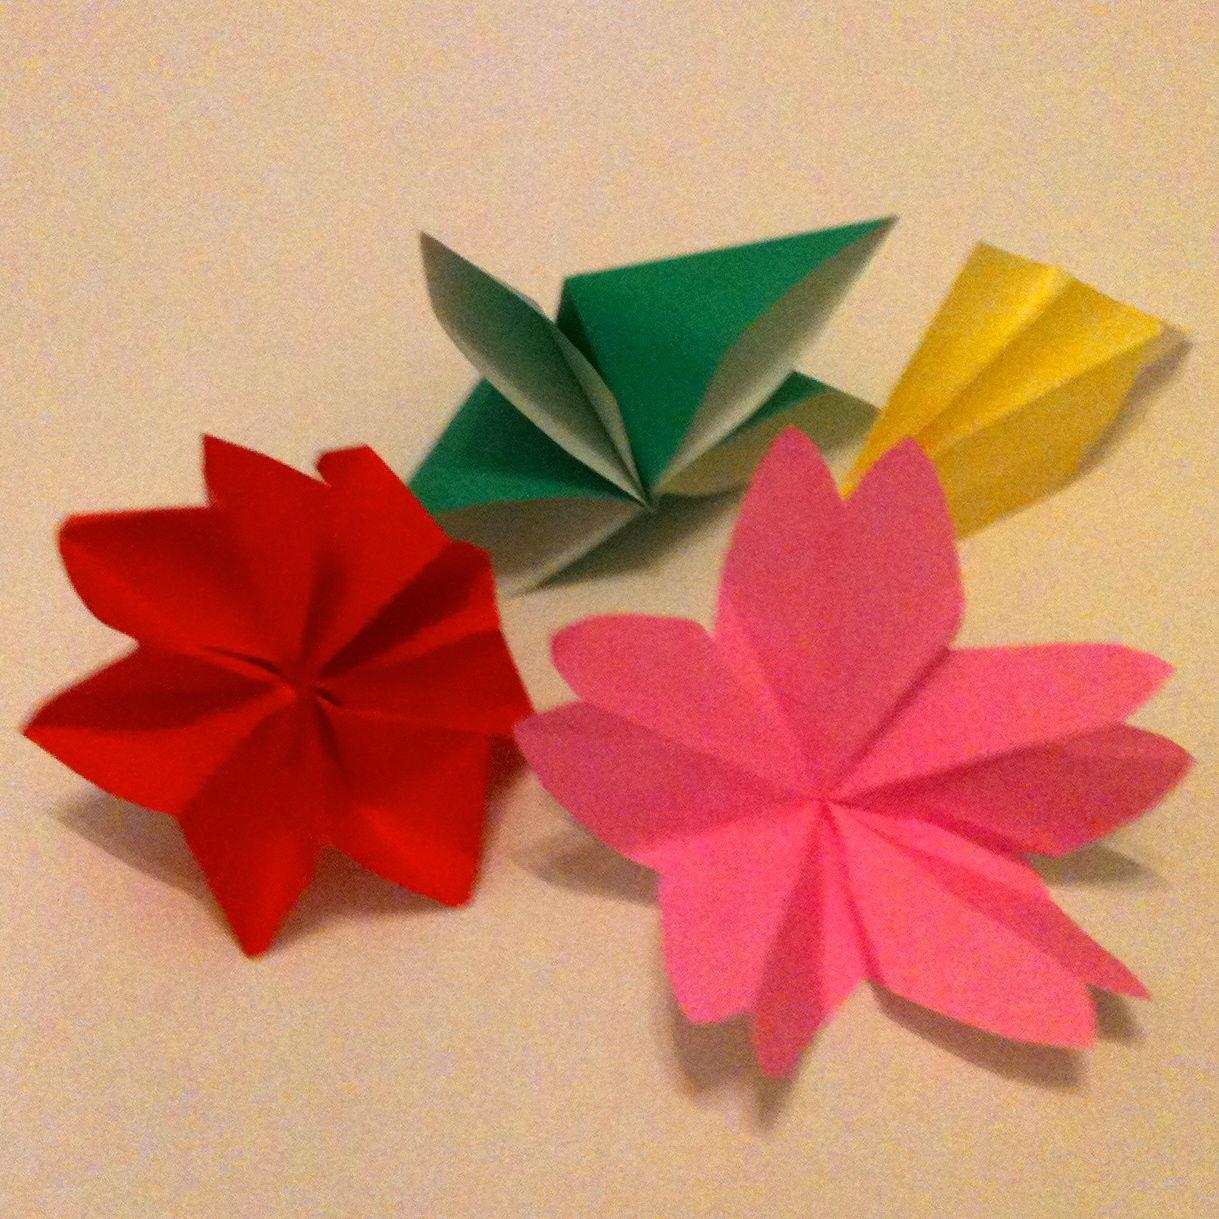 die ersten origami blumen. Black Bedroom Furniture Sets. Home Design Ideas